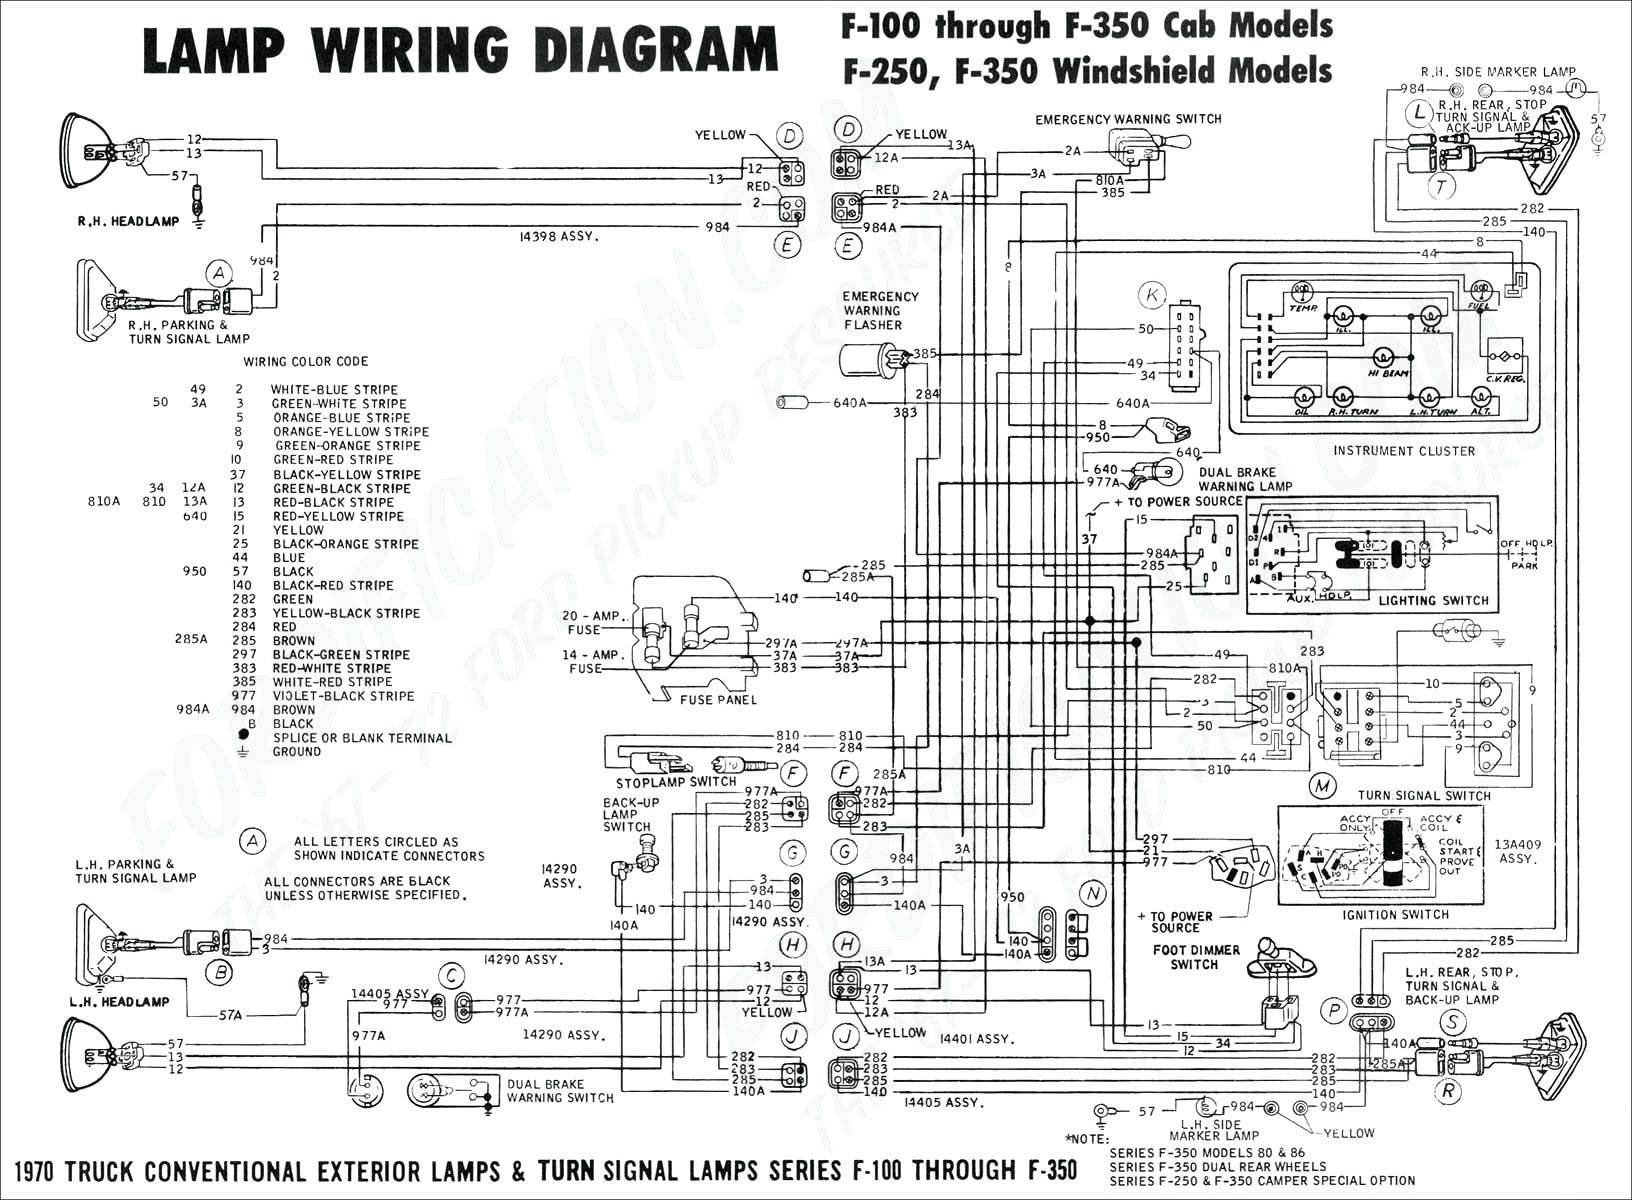 2001 ford F150 Engine Diagram 2001 ford F 150 Wiring Diagram for 4x4 Wiring Diagram toolbox